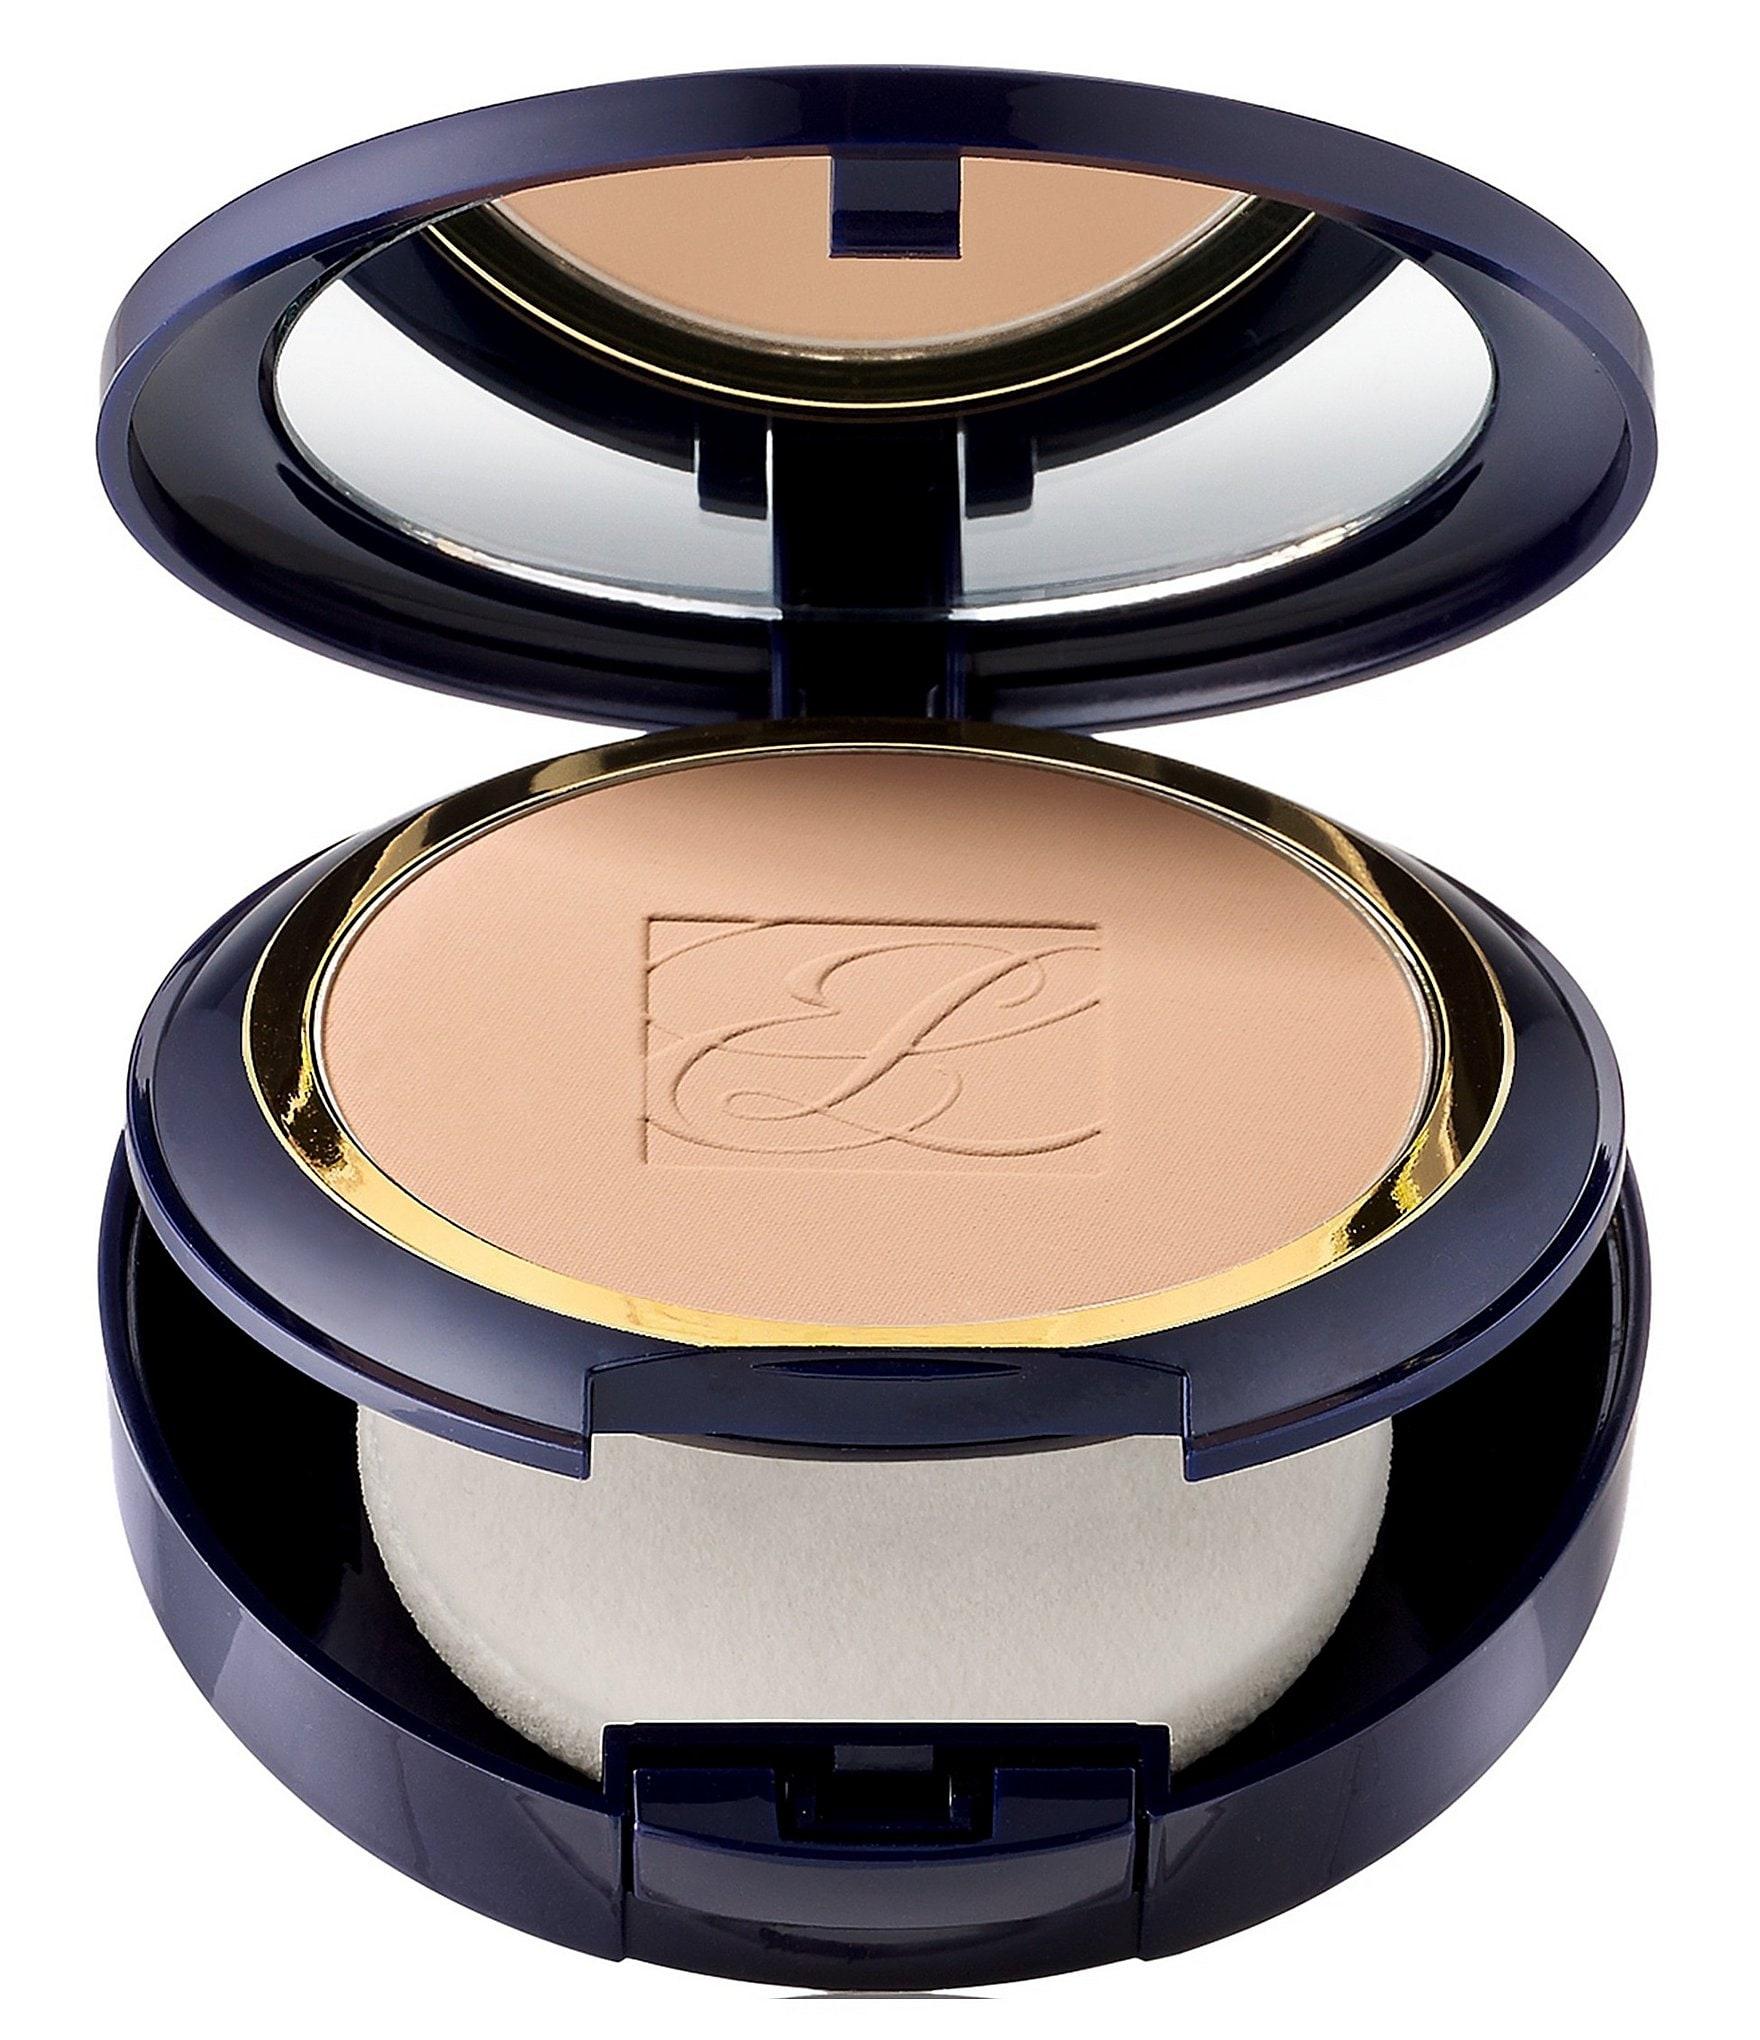 Estee Lauder Double Wear Stay-in-Place Powder Makeup ...